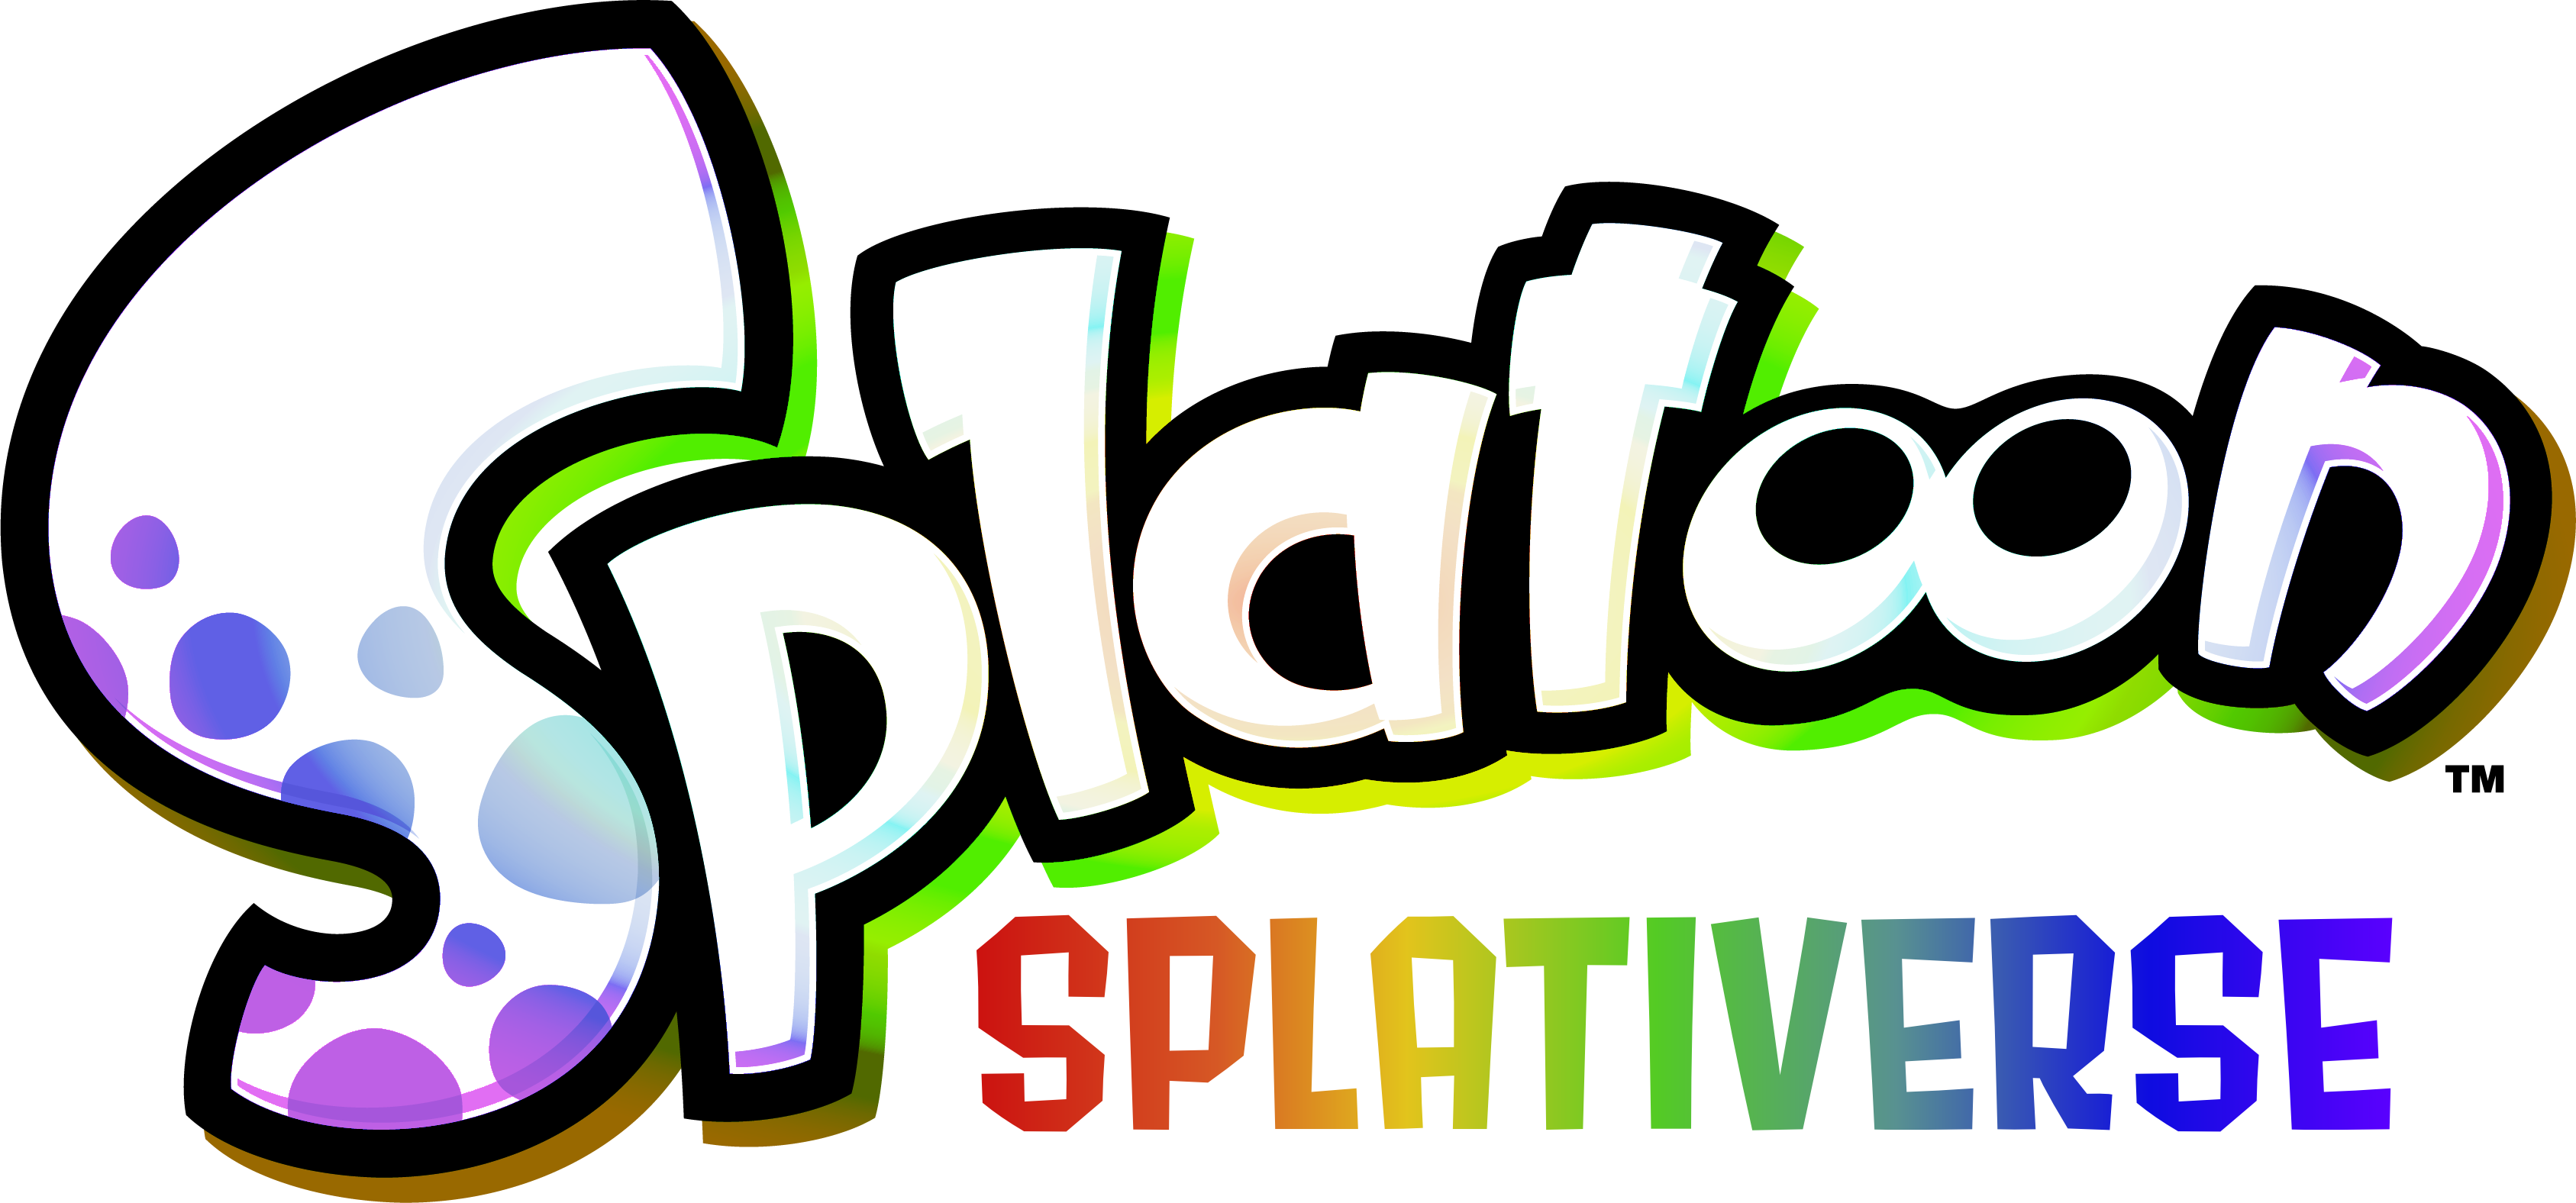 Splatoon: Splativerse